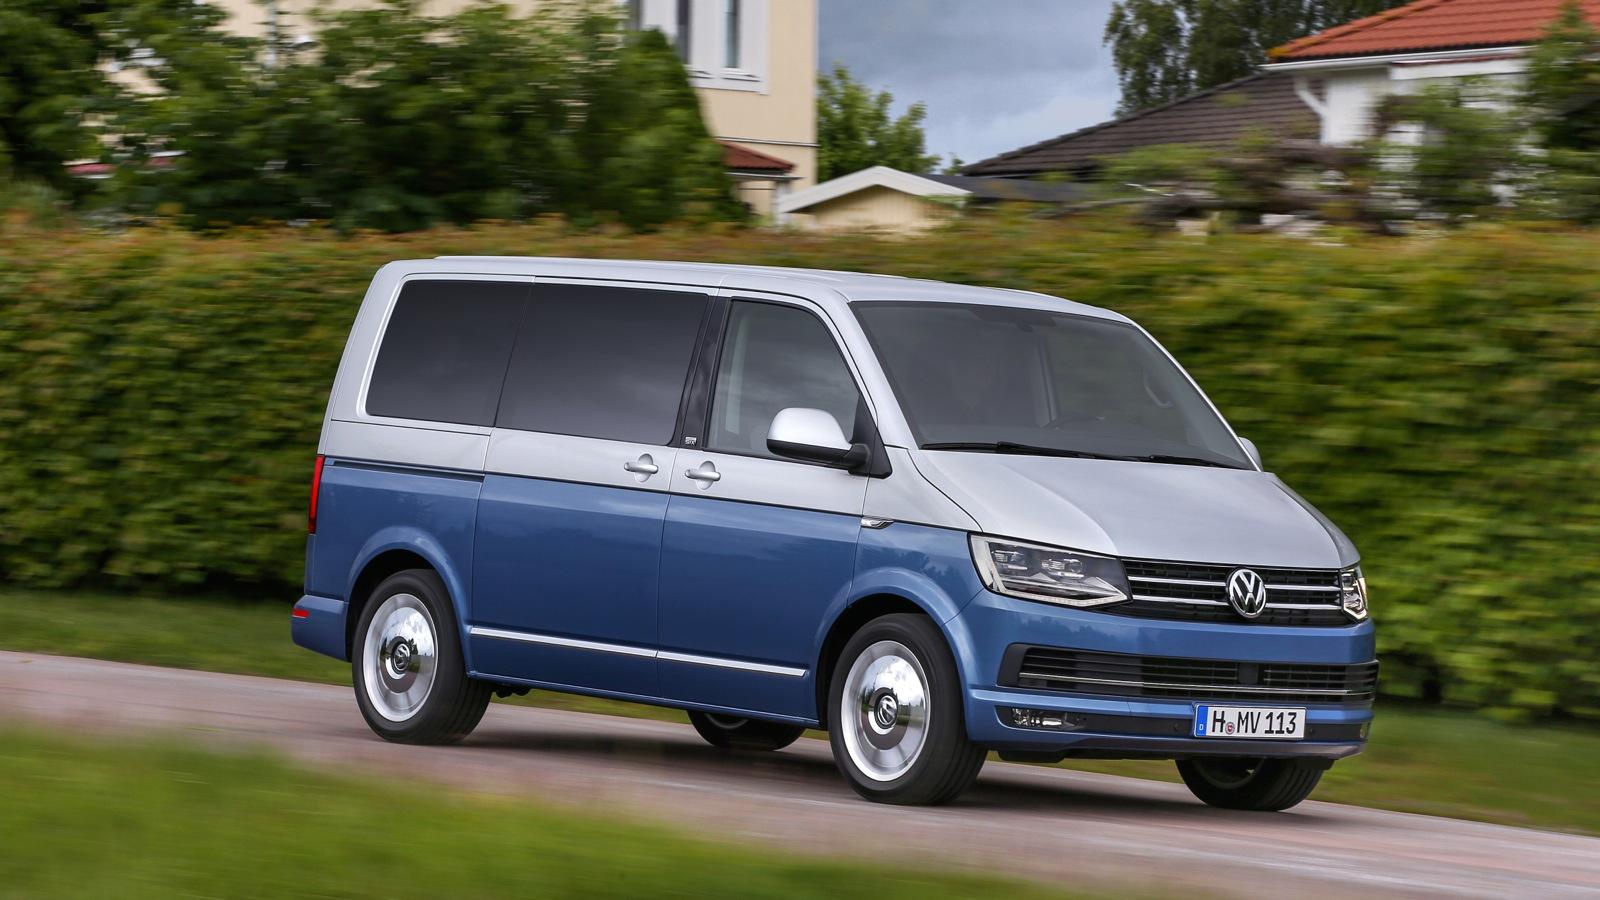 Volkswagen Multivan Generation Six Review - photos | CarAdvice